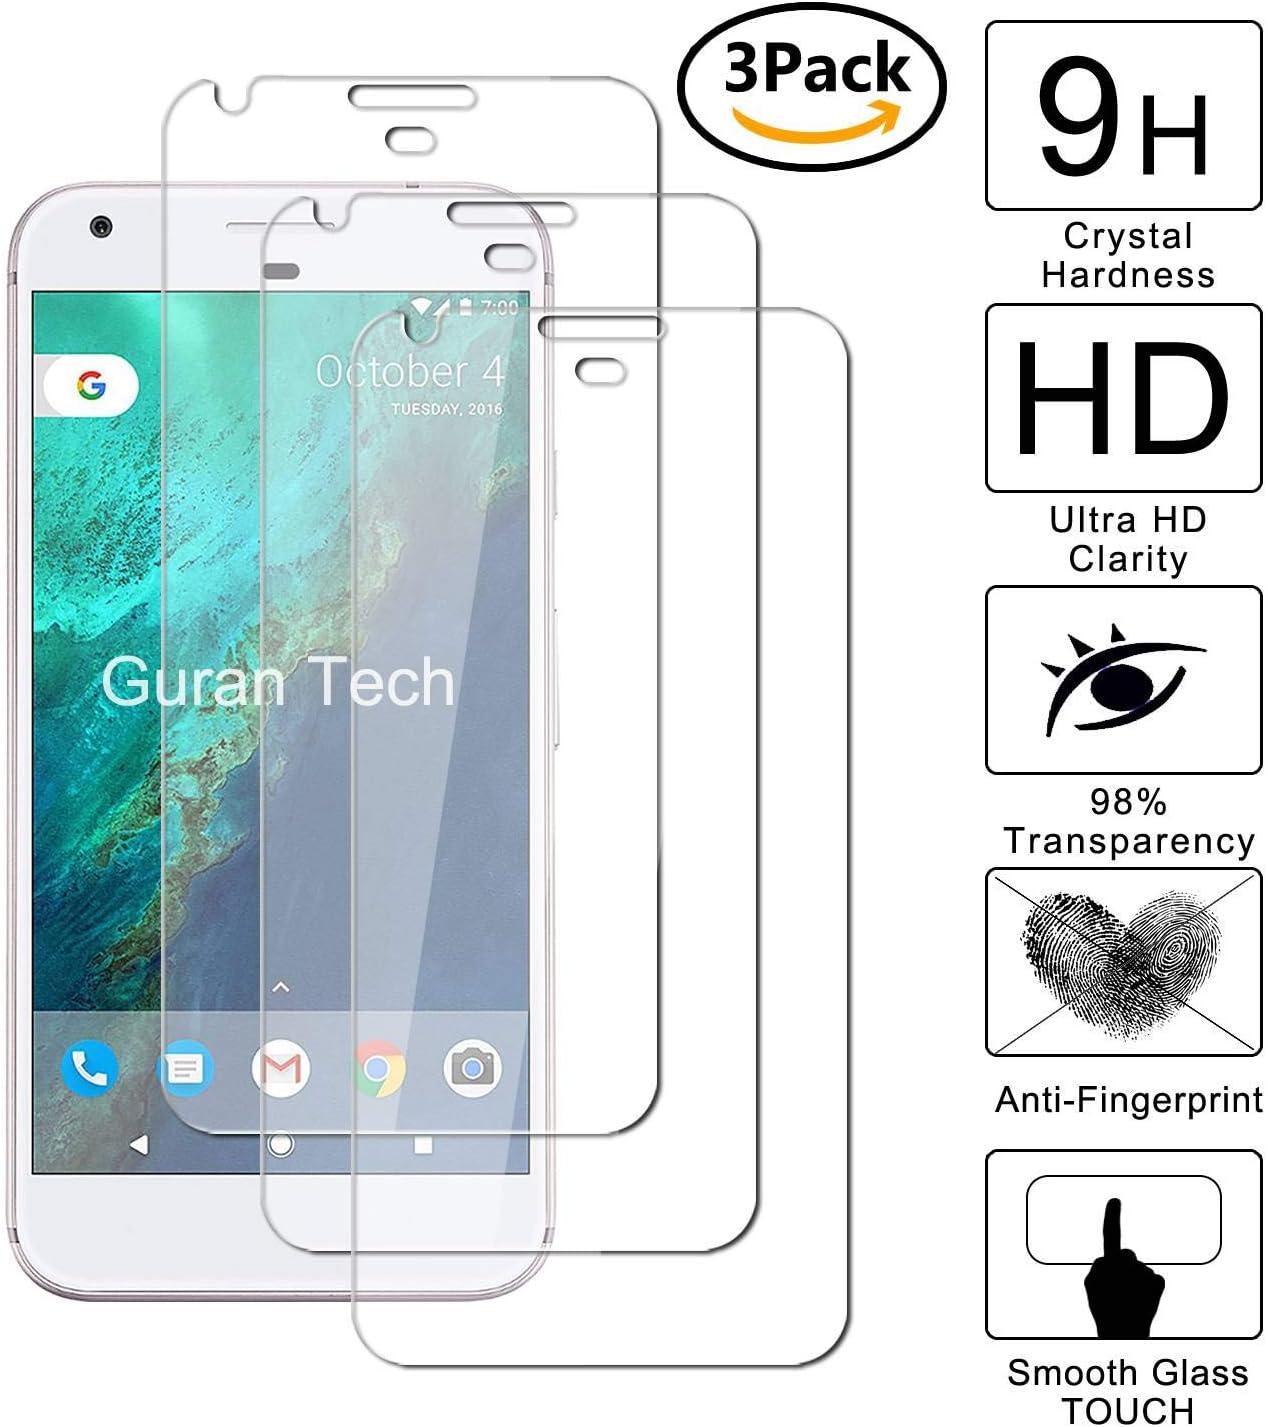 Guran [3-Unidades] Protector de Pantalla Vidrio Cristal Templado para Lenovo ZUK Z2 Pro Smartphone Cristal Vidrio Templado Film (9H, 2.5D Edge, 0.3mm): Amazon.es: Electrónica